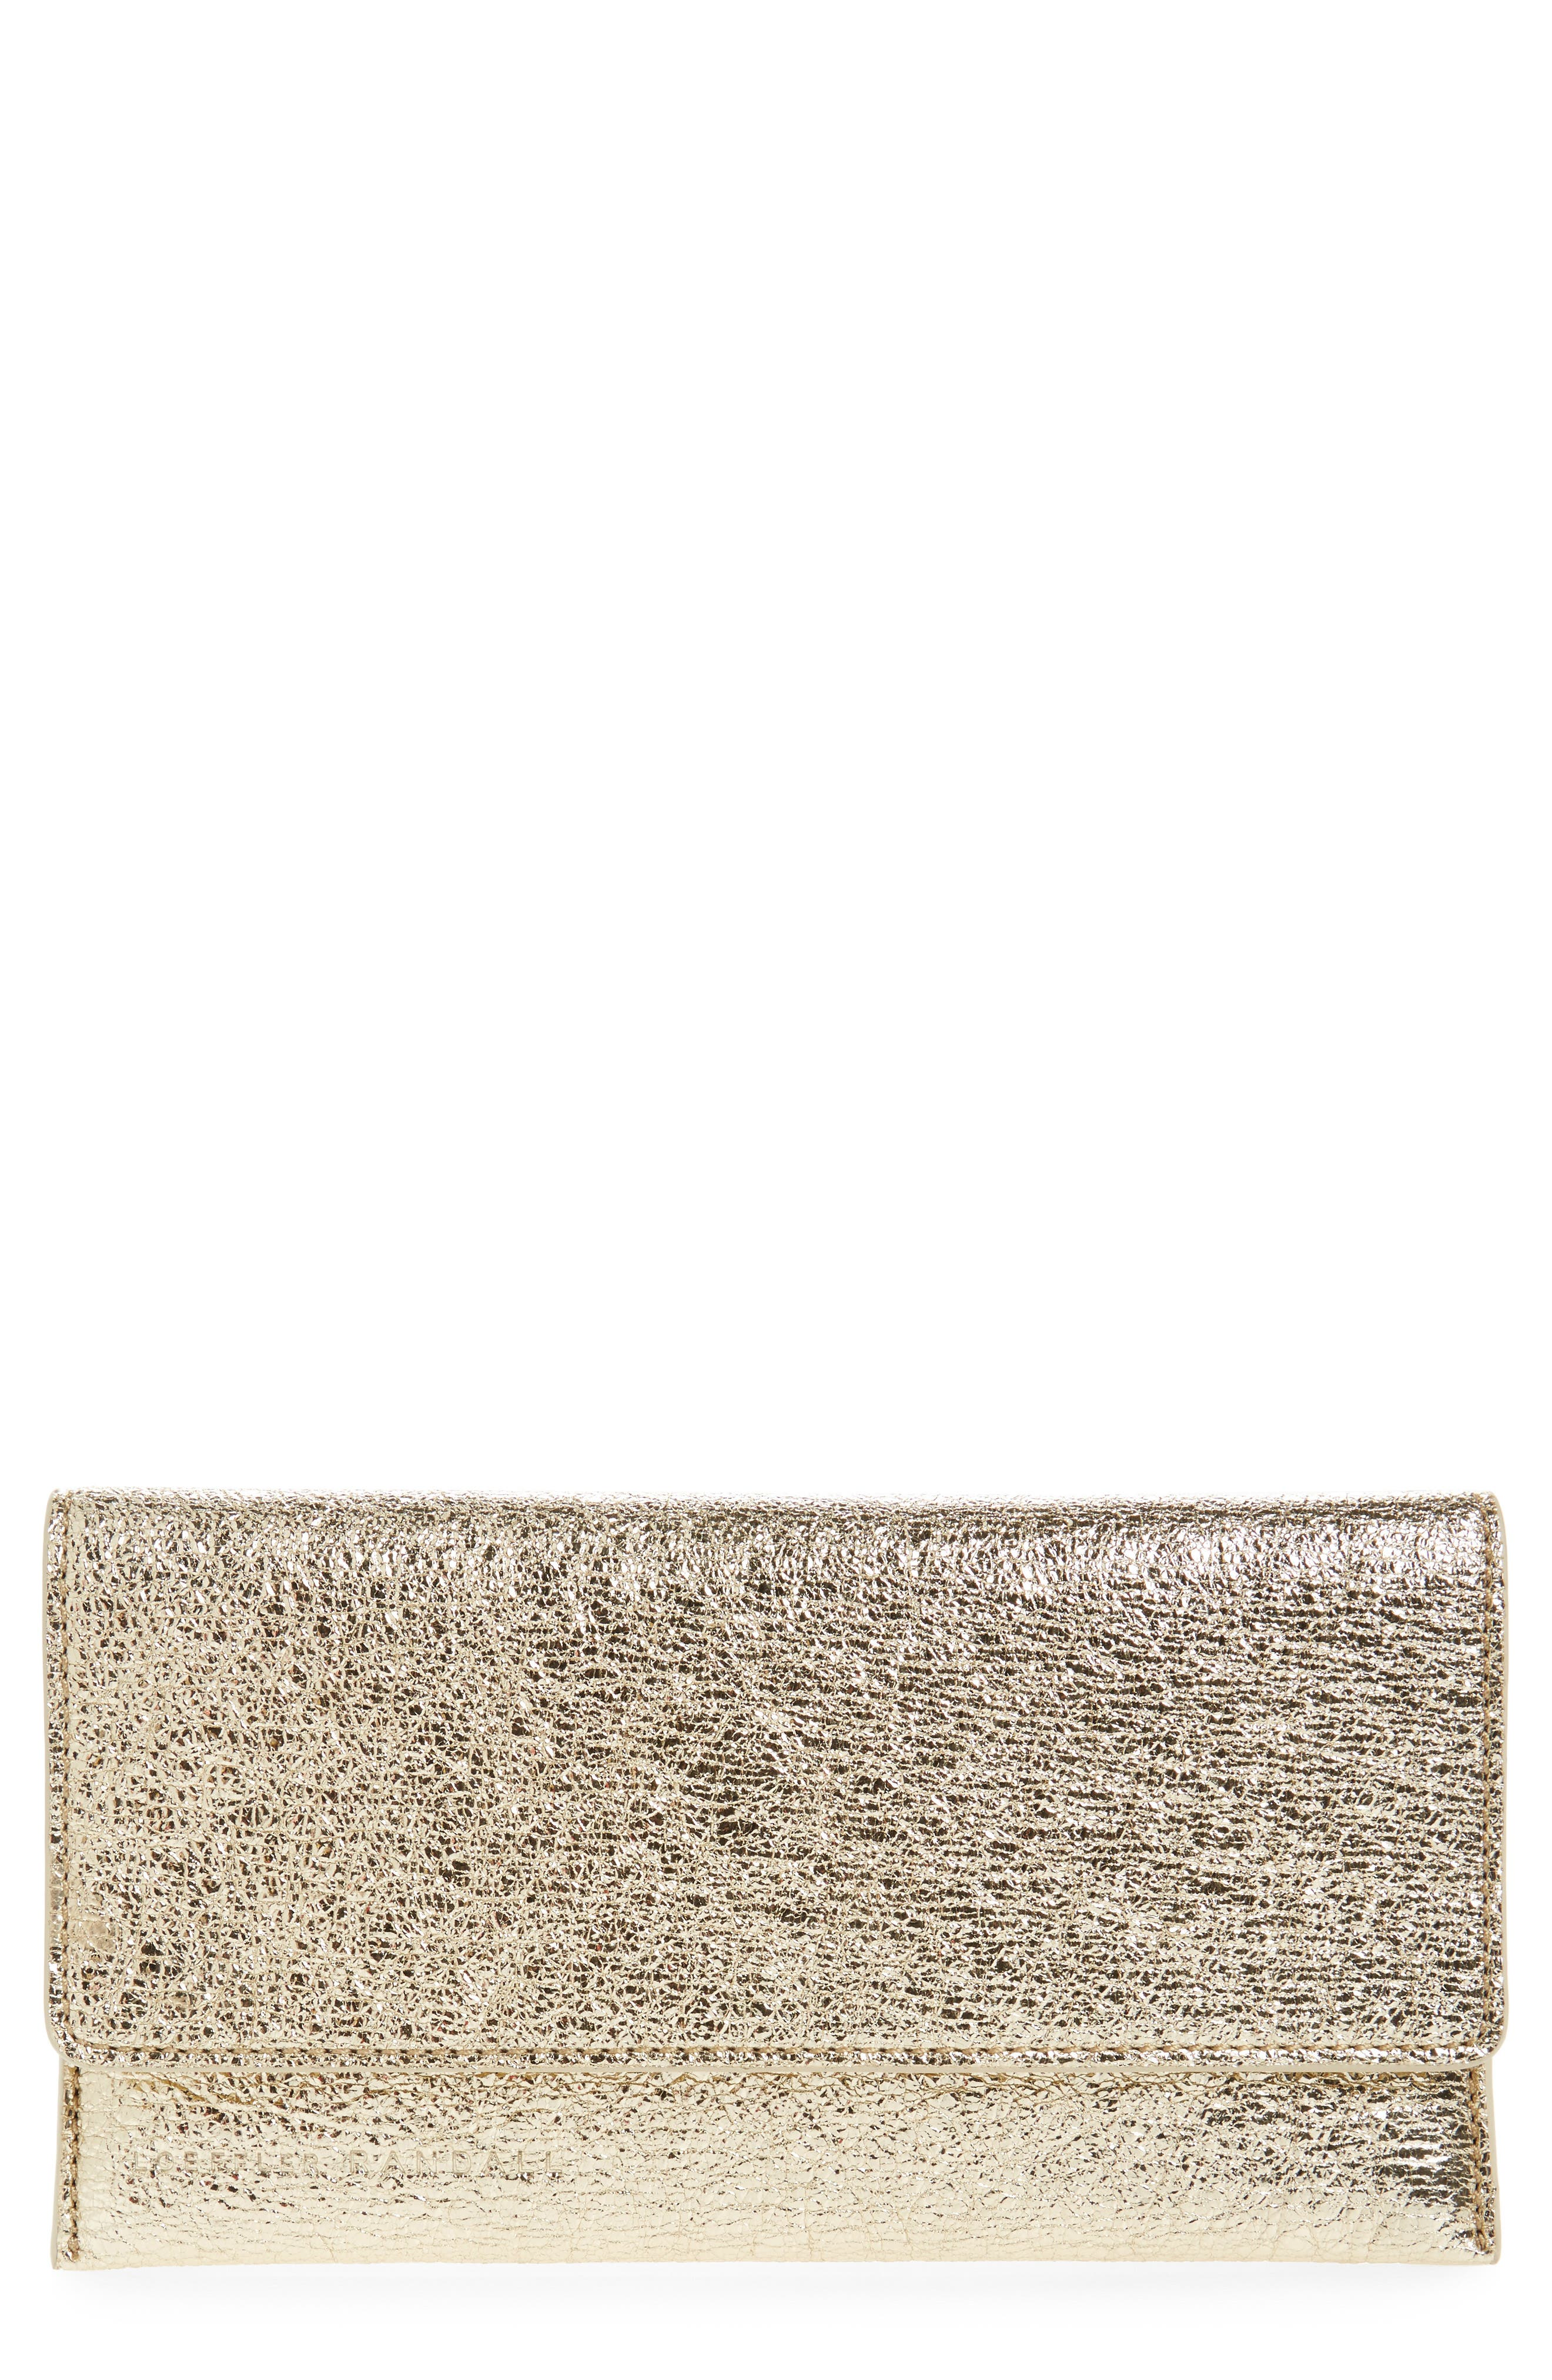 Loeffler Randall Everything Leather Wallet